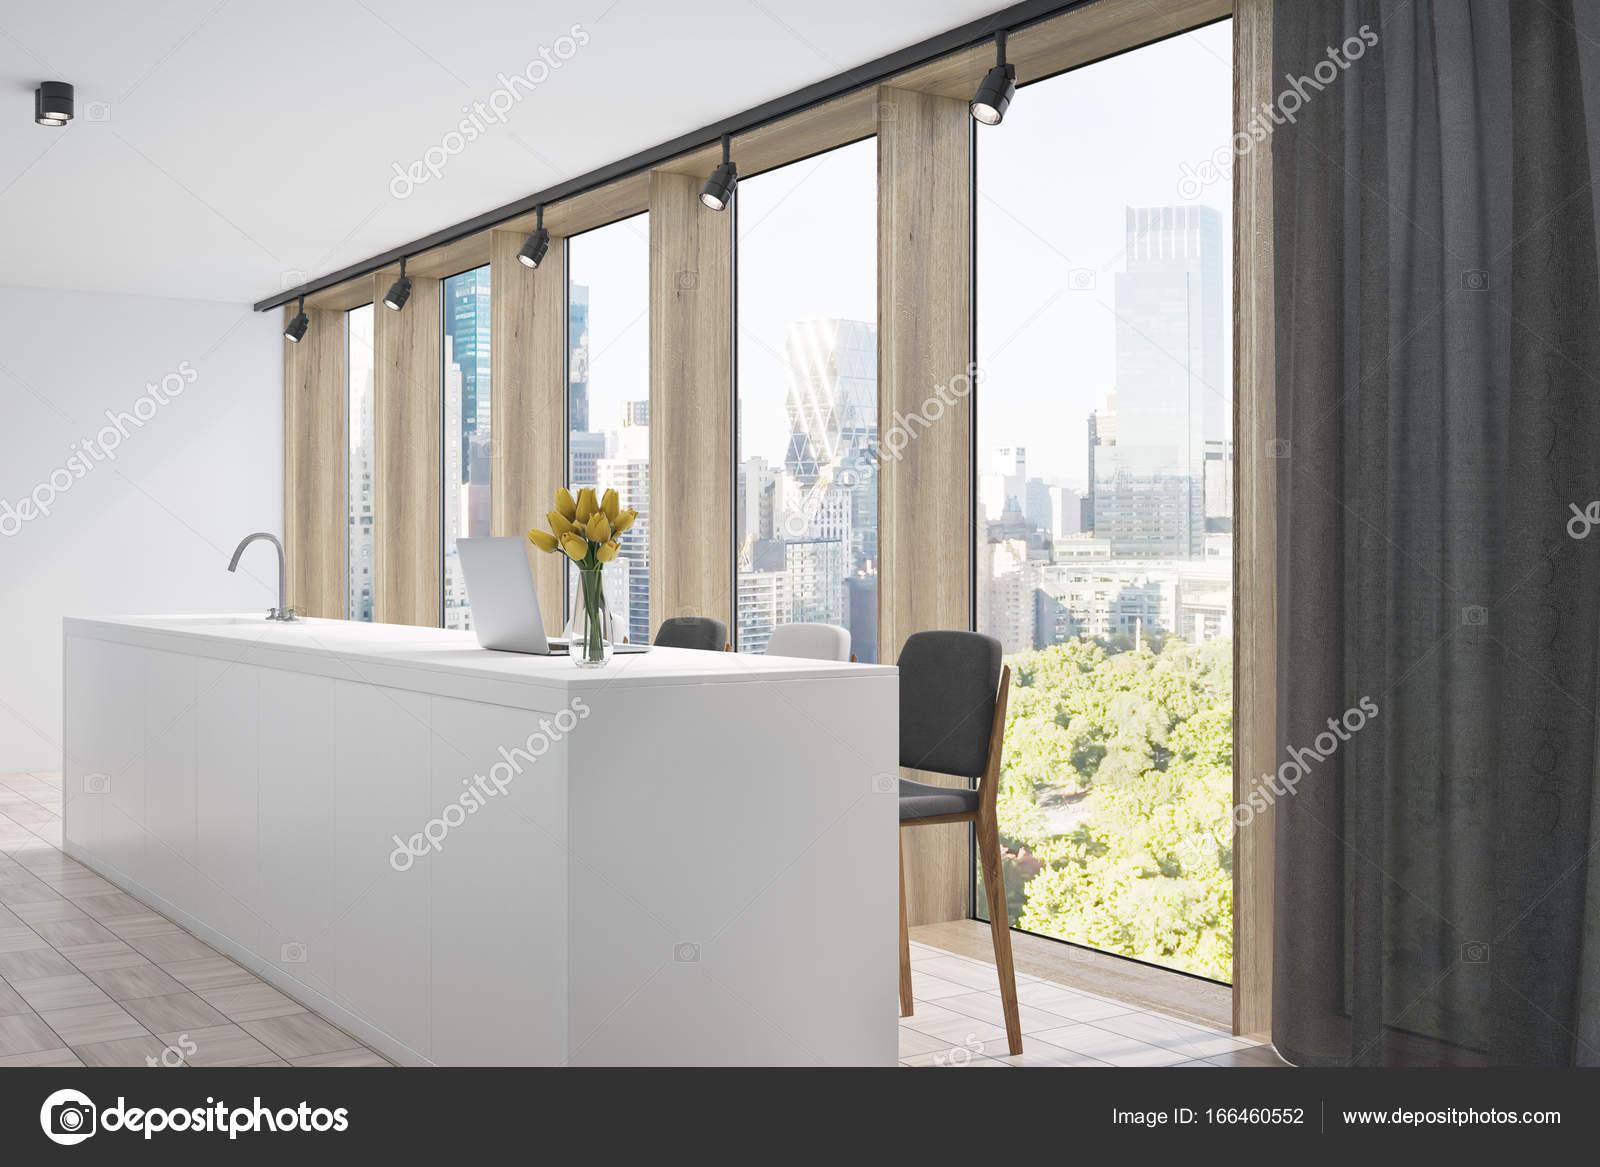 Cucina bianca con un bar un grigio sgabello lato u foto stock